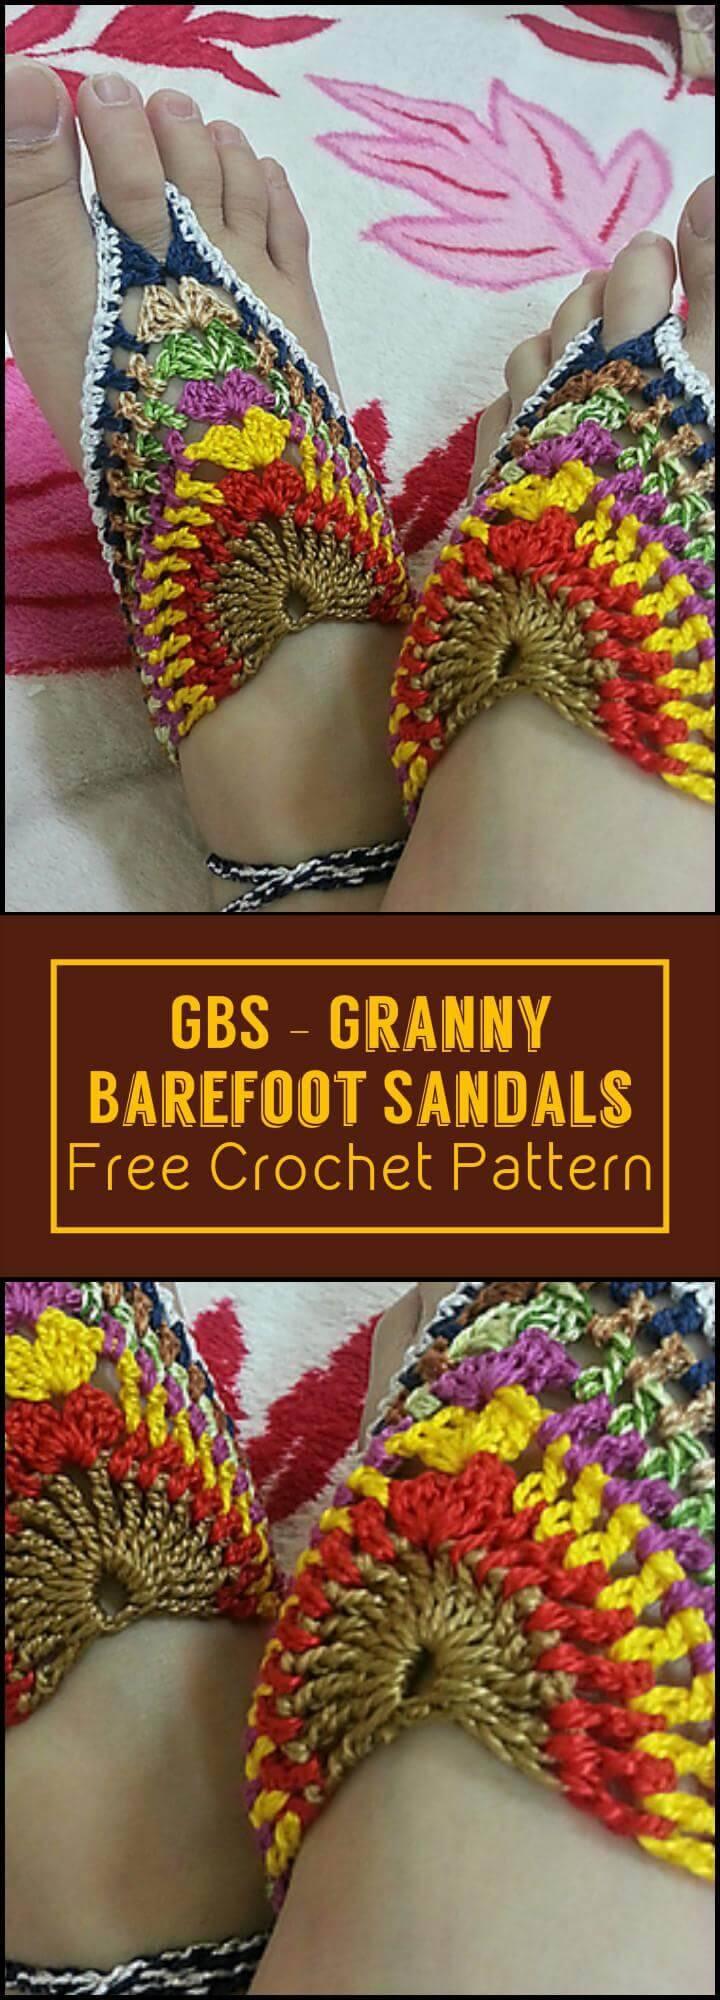 Crochet Barefoot Sandals 50 Free Crochet Patterns Diy Crafts